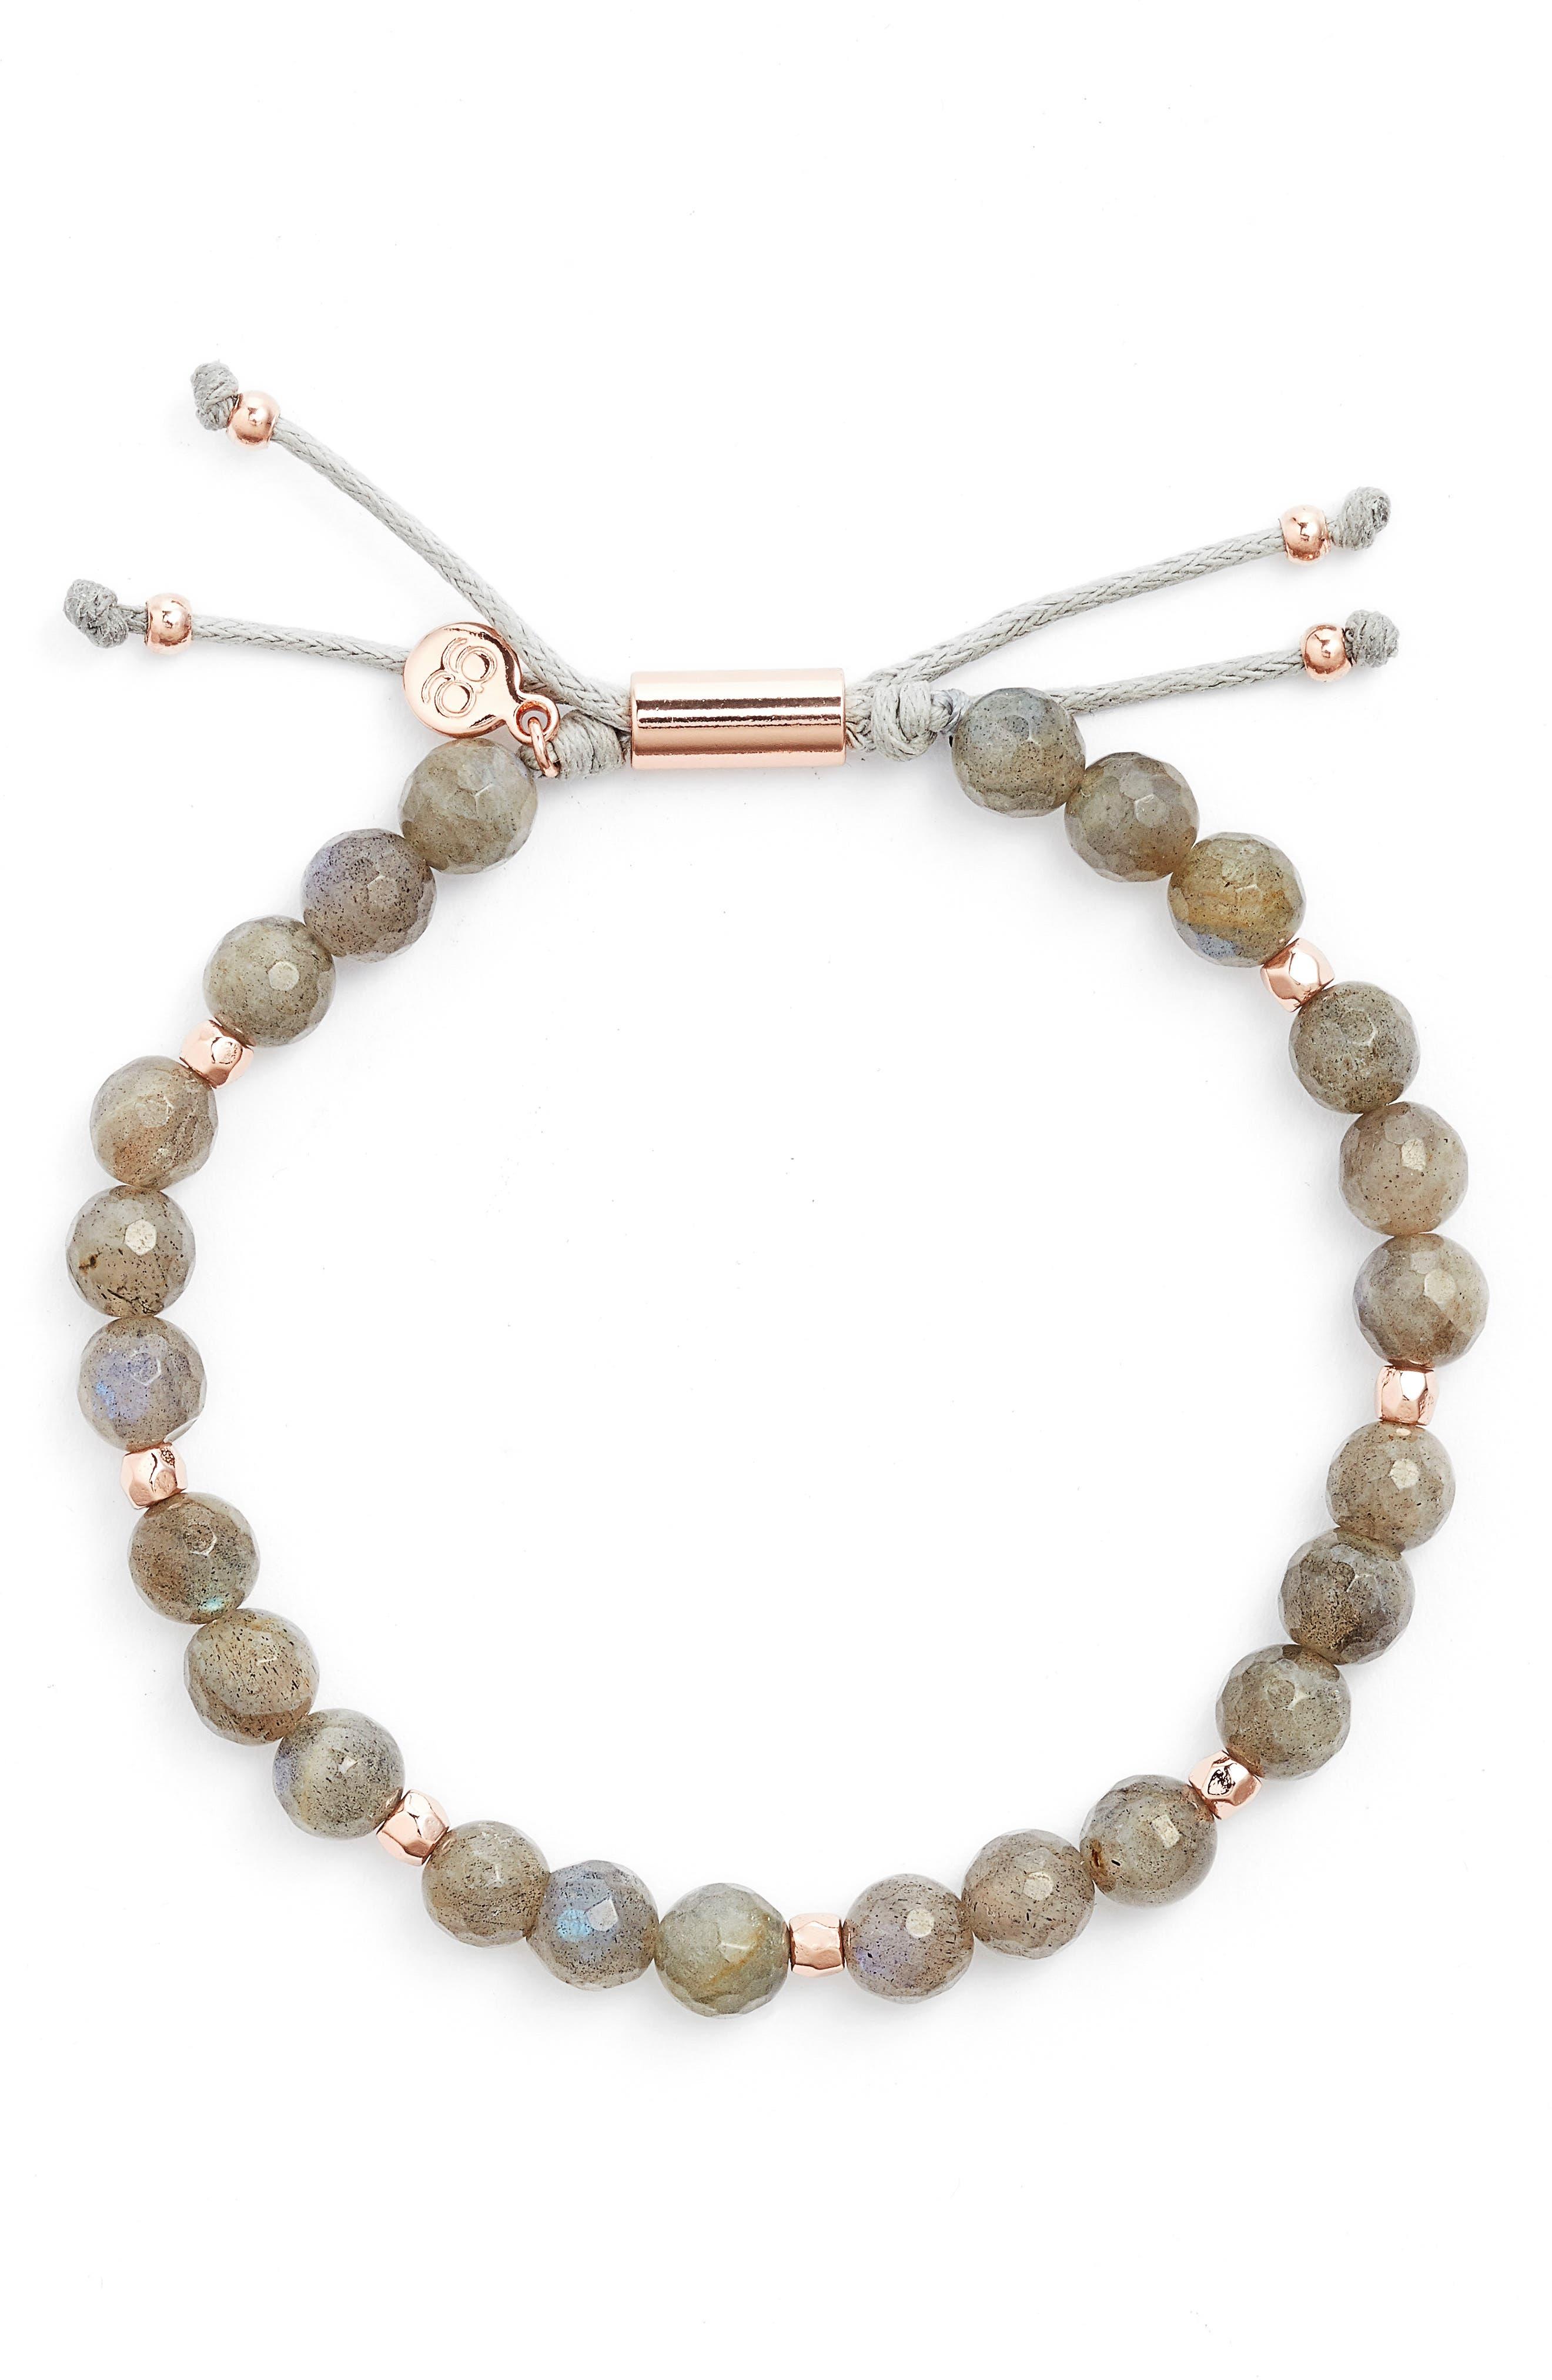 Power Bead Adjustable Bracelet,                             Main thumbnail 1, color,                             020